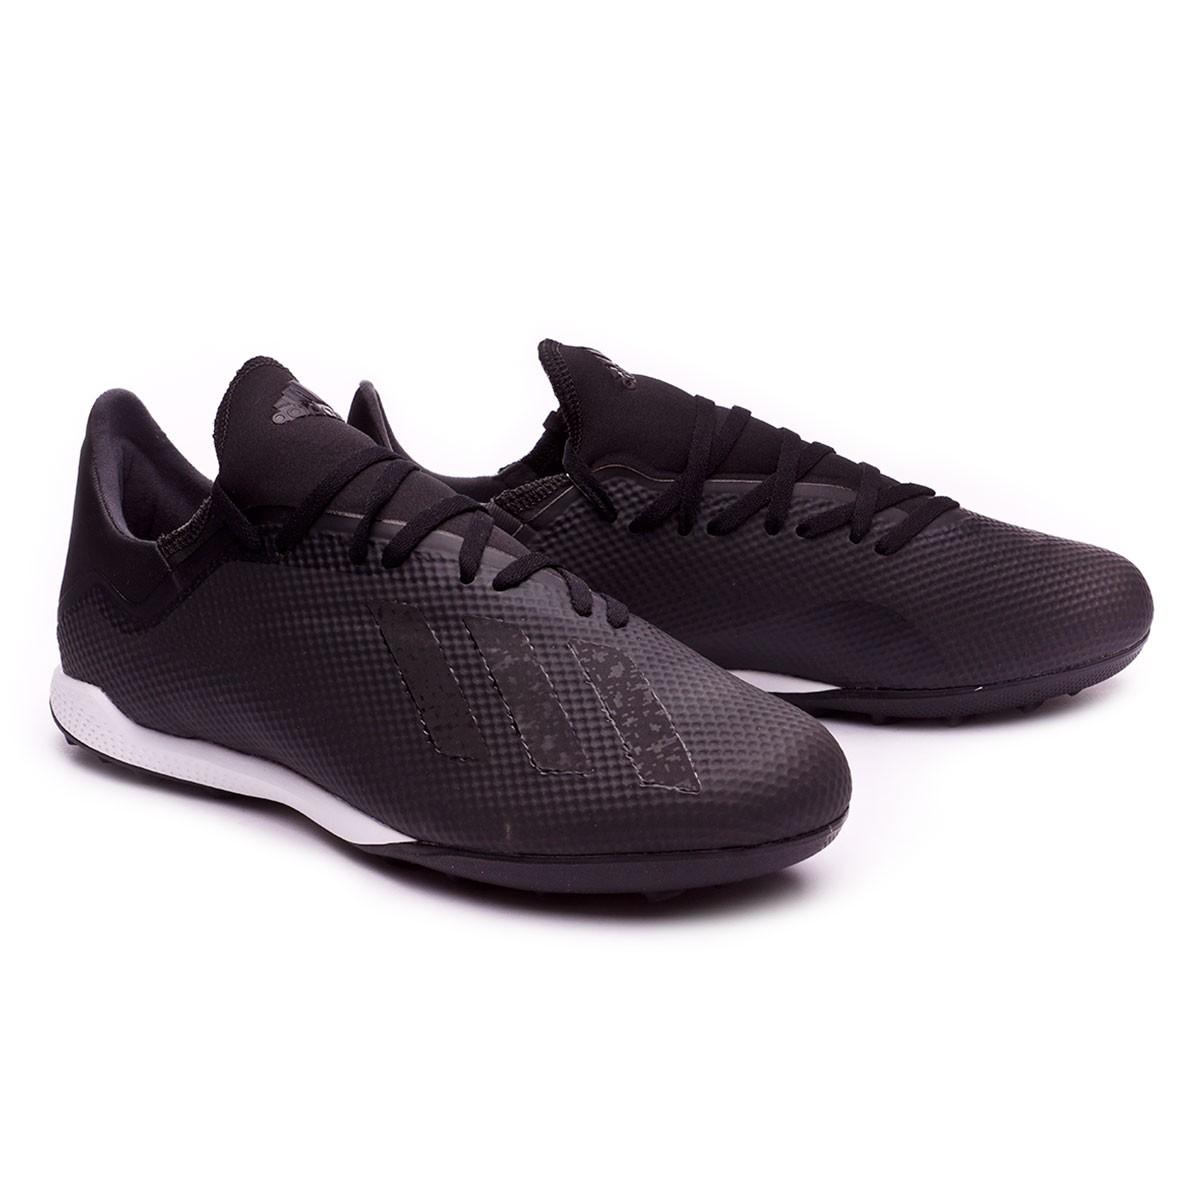 887222739 Football Boot adidas X Tango 18.3 Turf Core black-White - Football store  Fútbol Emotion